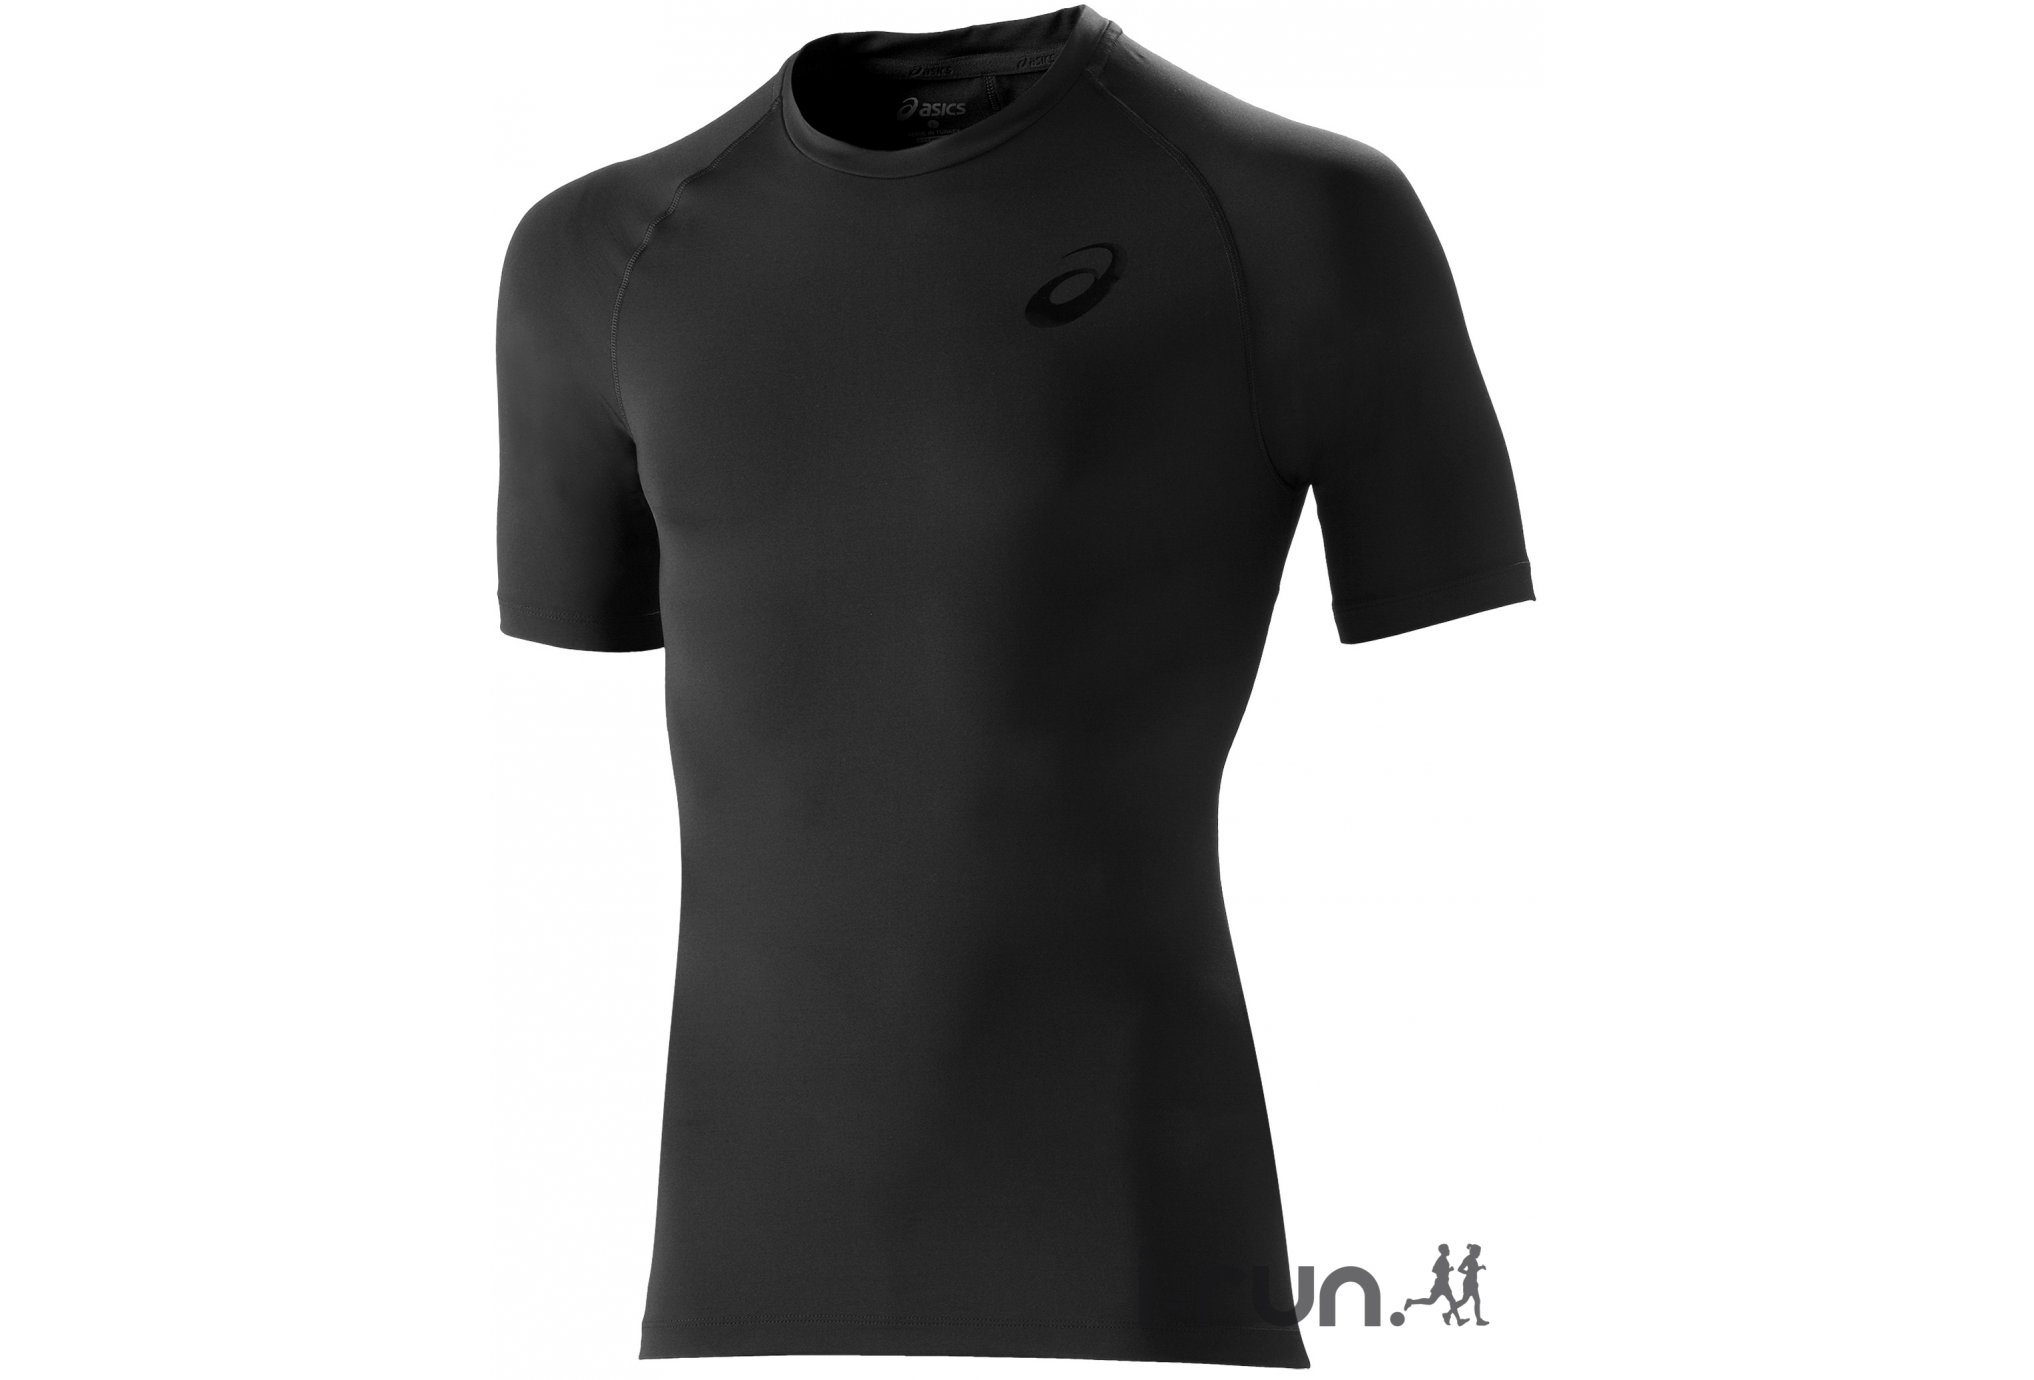 Asics Tee shirt inner muscle m vêtement running homme